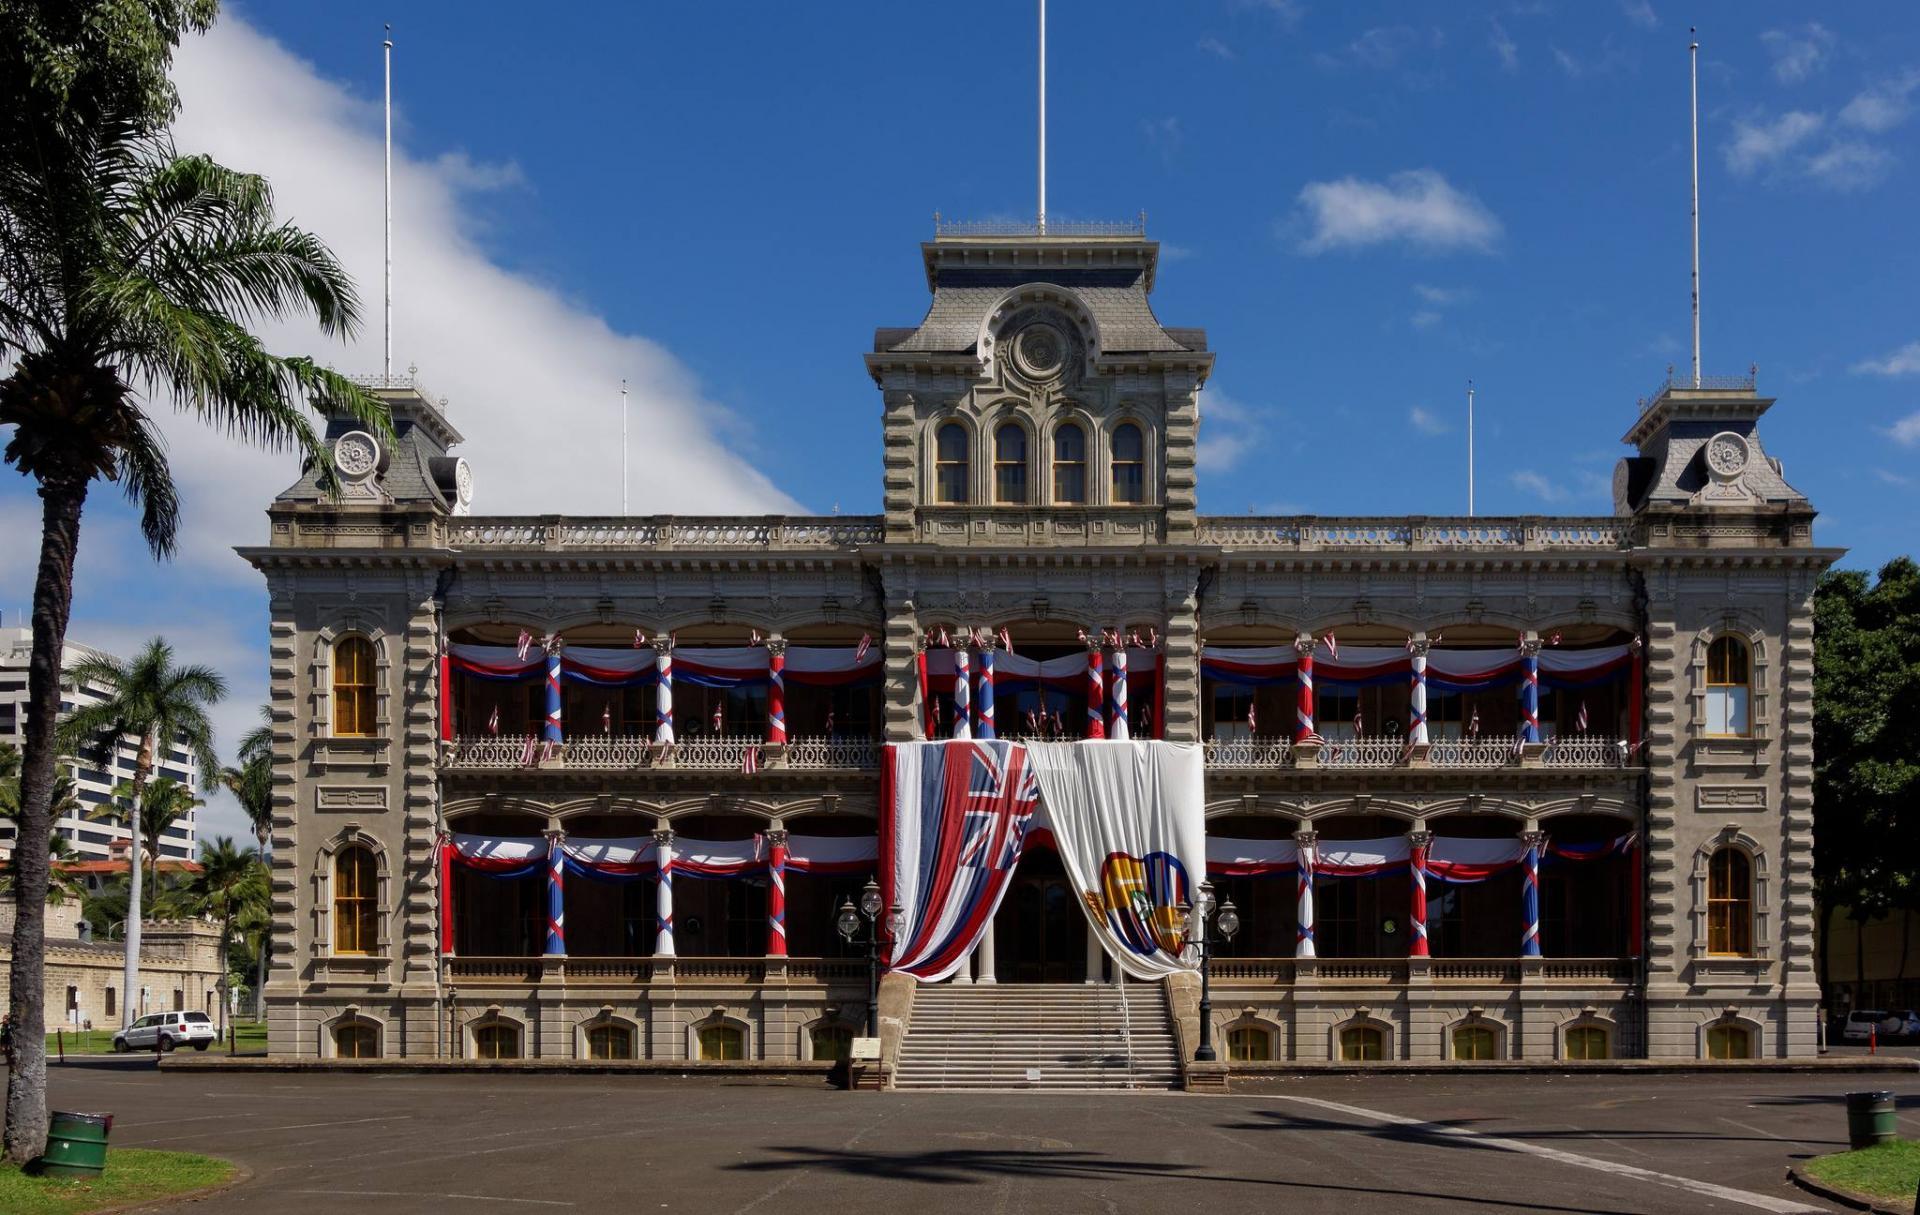 Palais royale de Hawaï